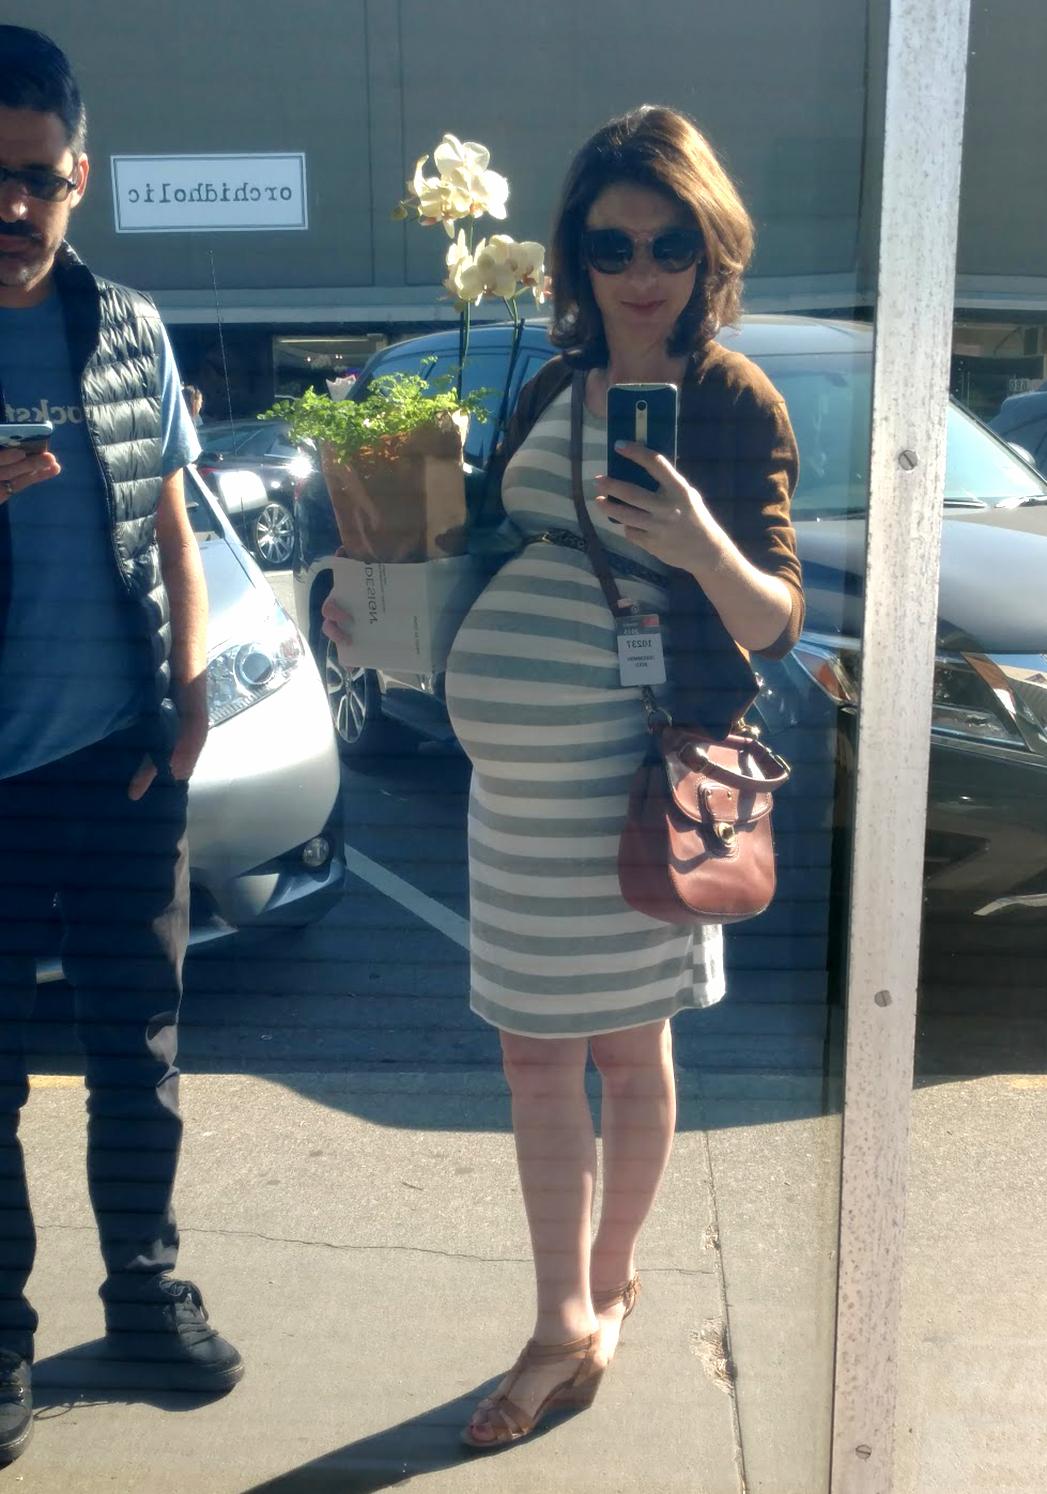 San Francisco 9 months pregnant